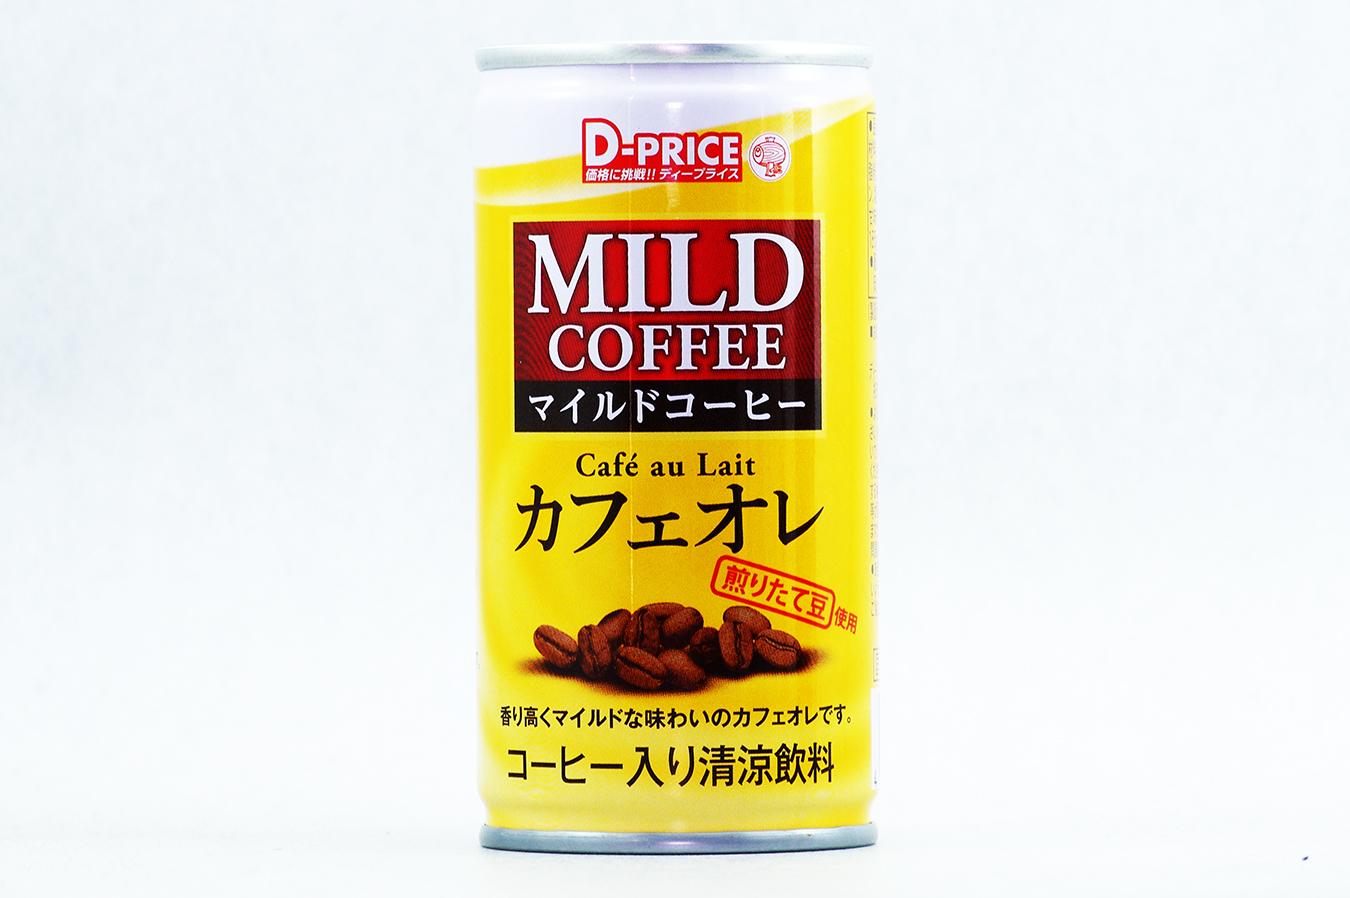 D-PRICE マイルドコーヒー カフェオレ 2017年11月